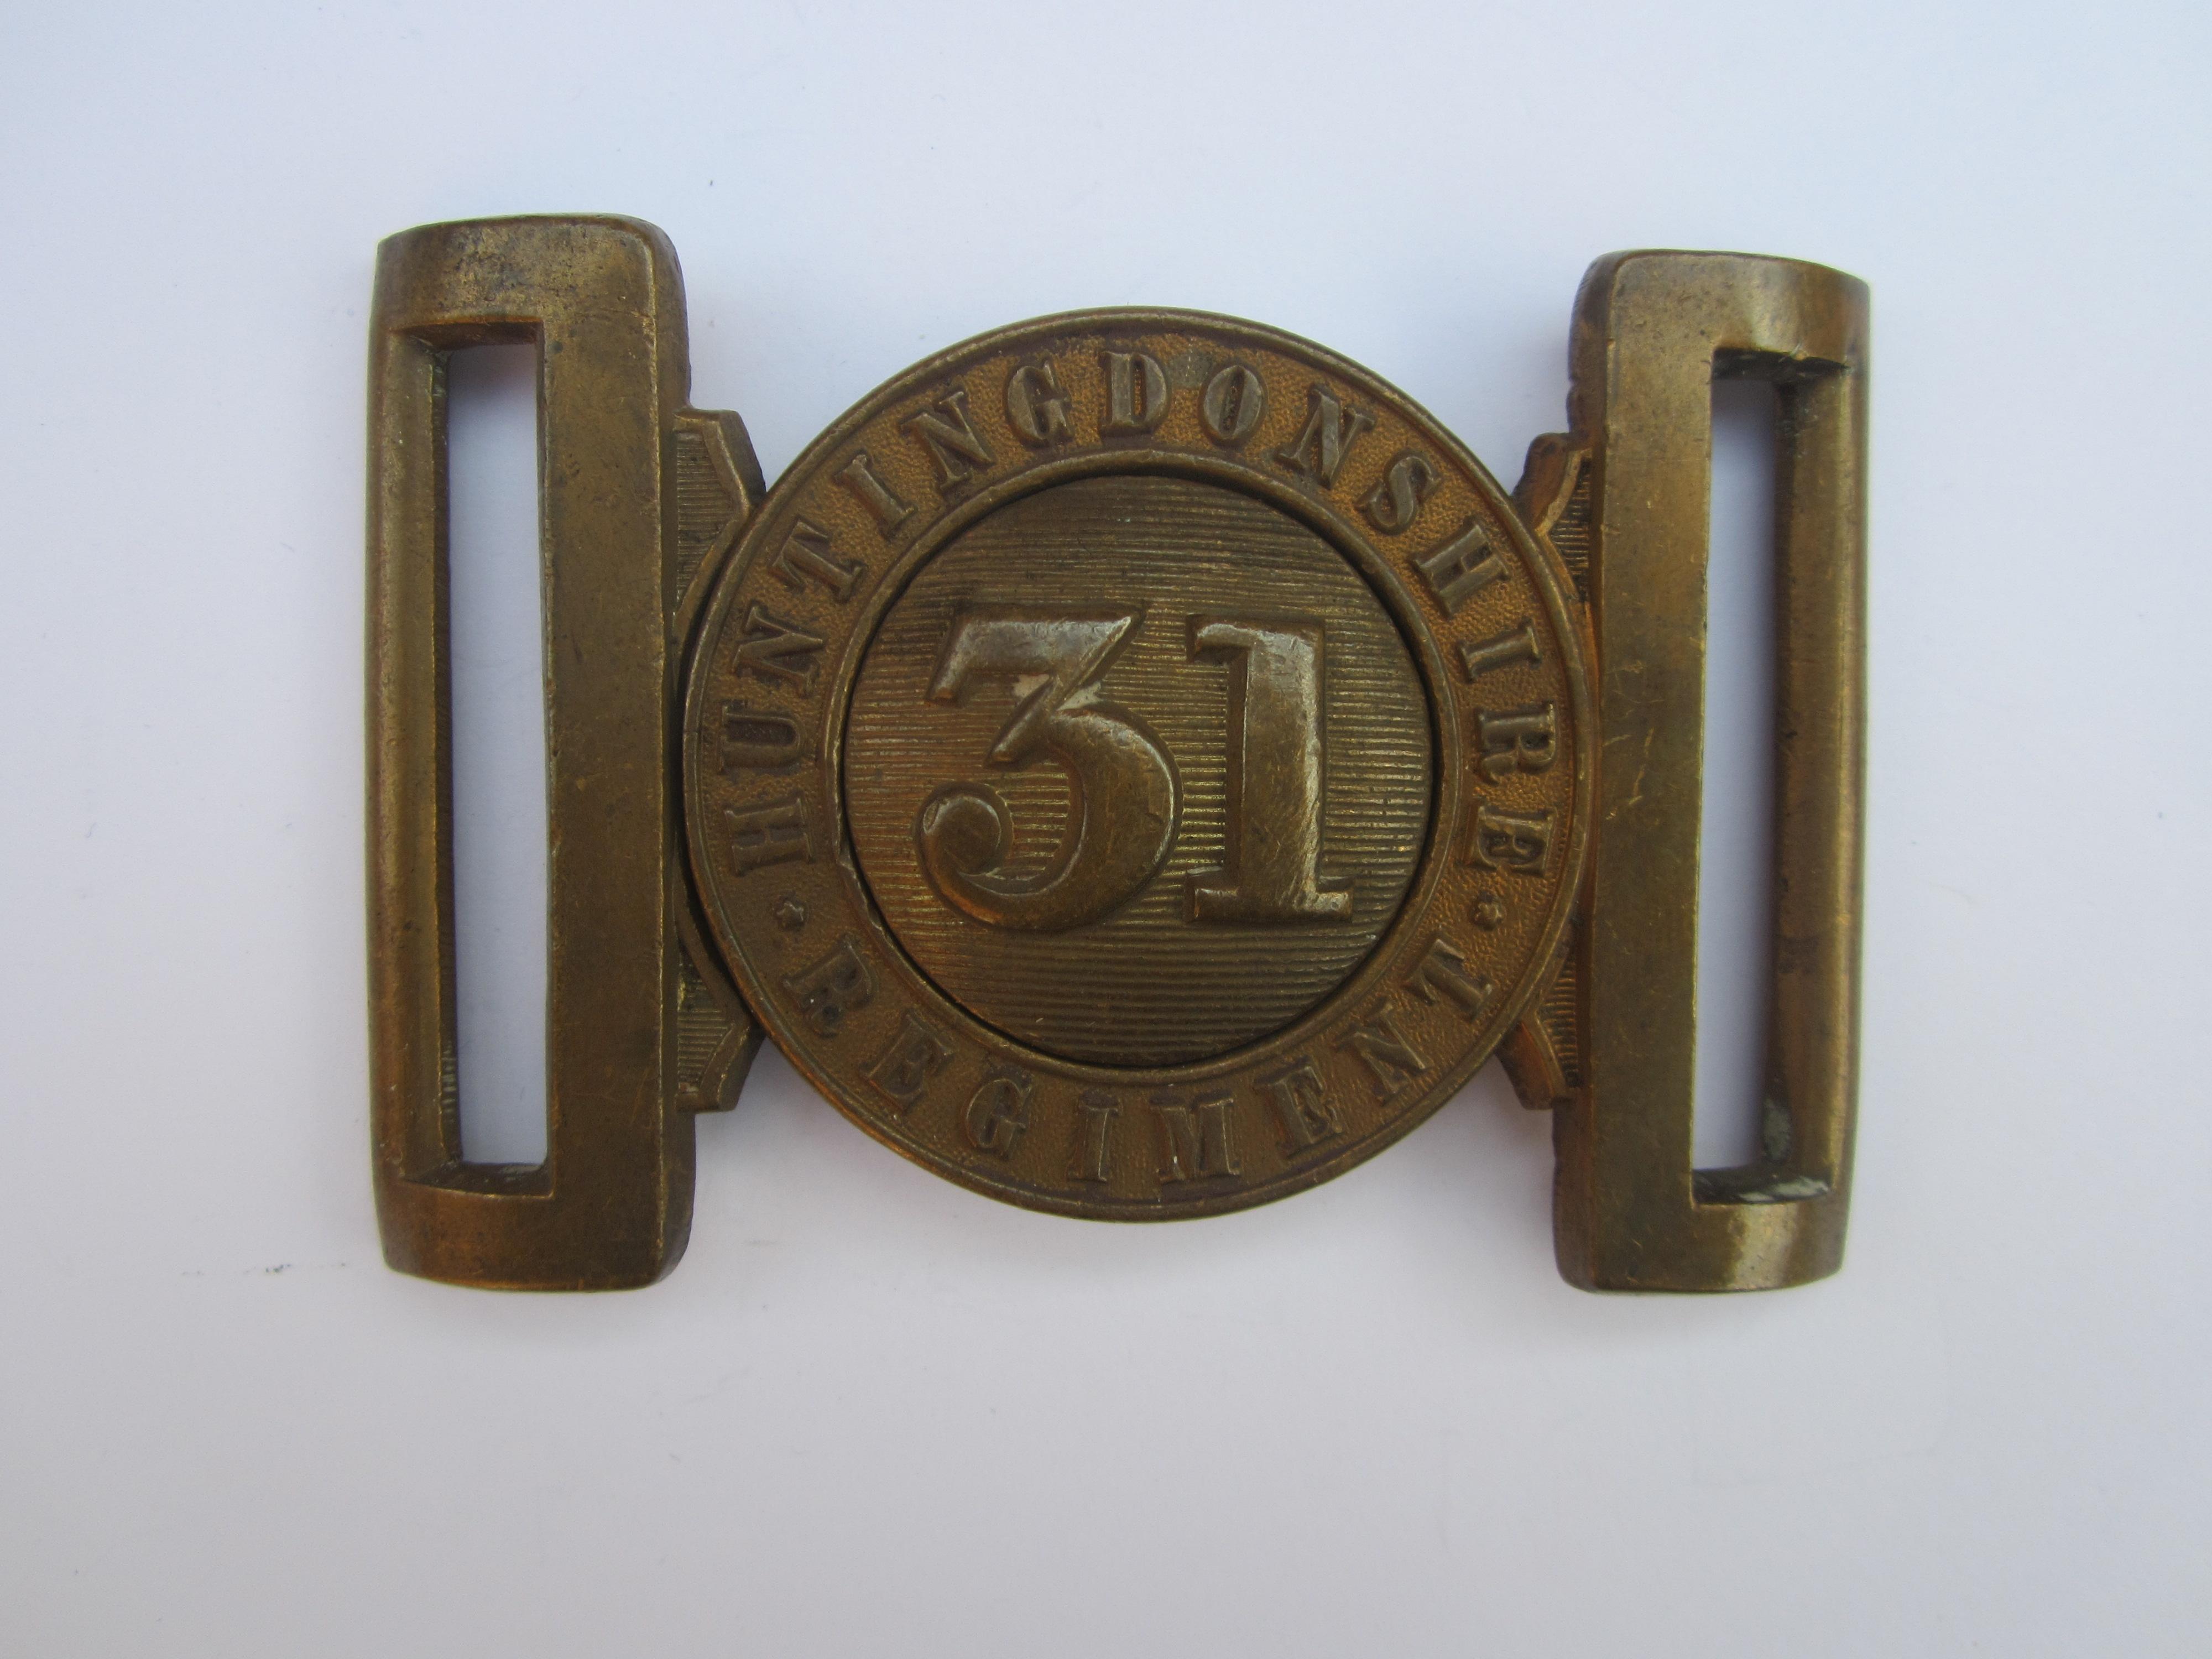 31st (Huntingdonshire) Regiment Other Ranks Waist Belt Clasp 1855-1871,